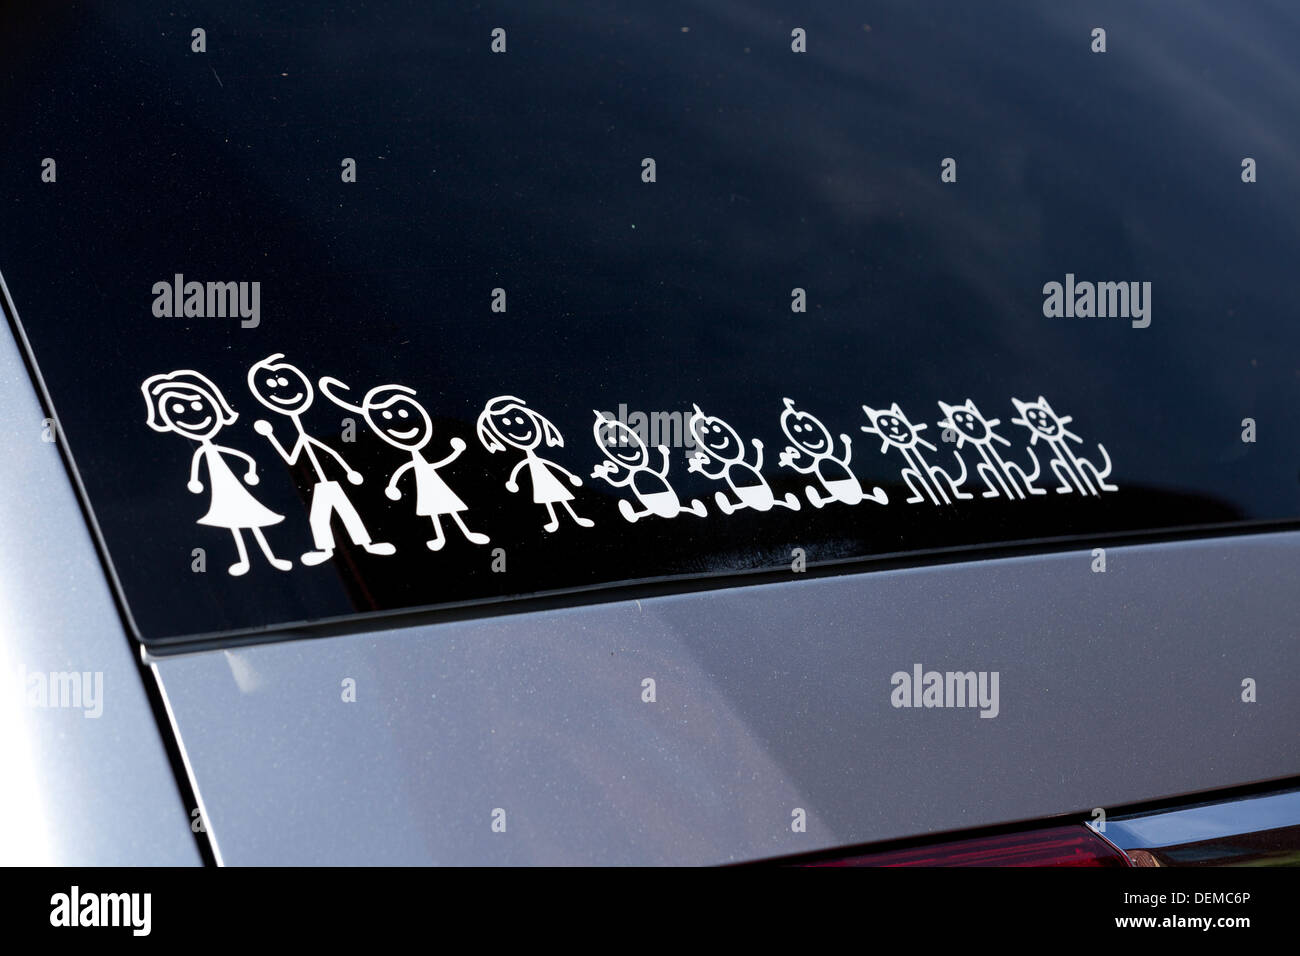 Large family stick figure decal on minivan rear windshield - USA - Stock Image